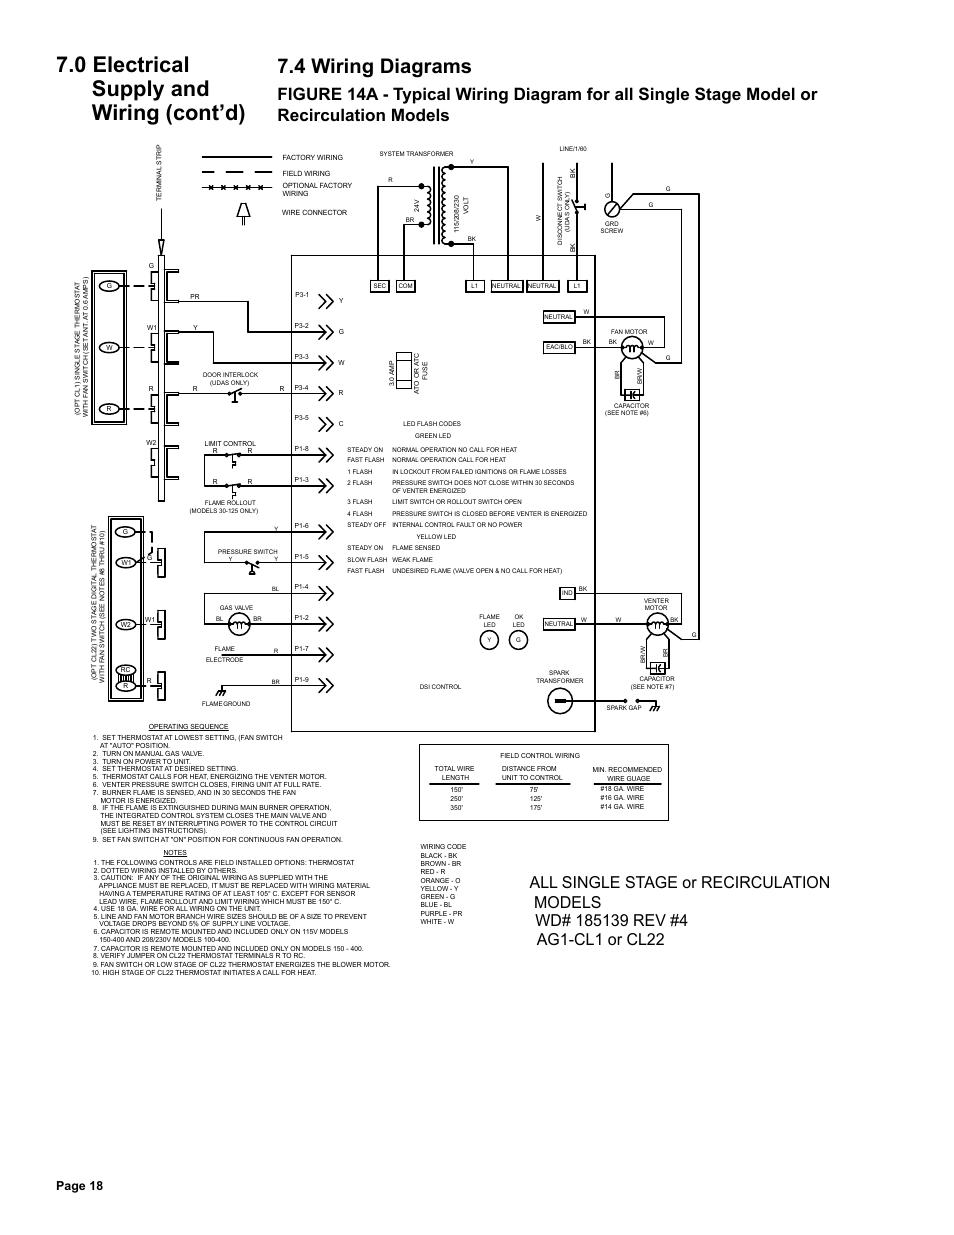 honeywell chronotherm iii wiring diagram 98 saturn sl2 reznor ua 50 schematic thermostat ~ elsalvadorla